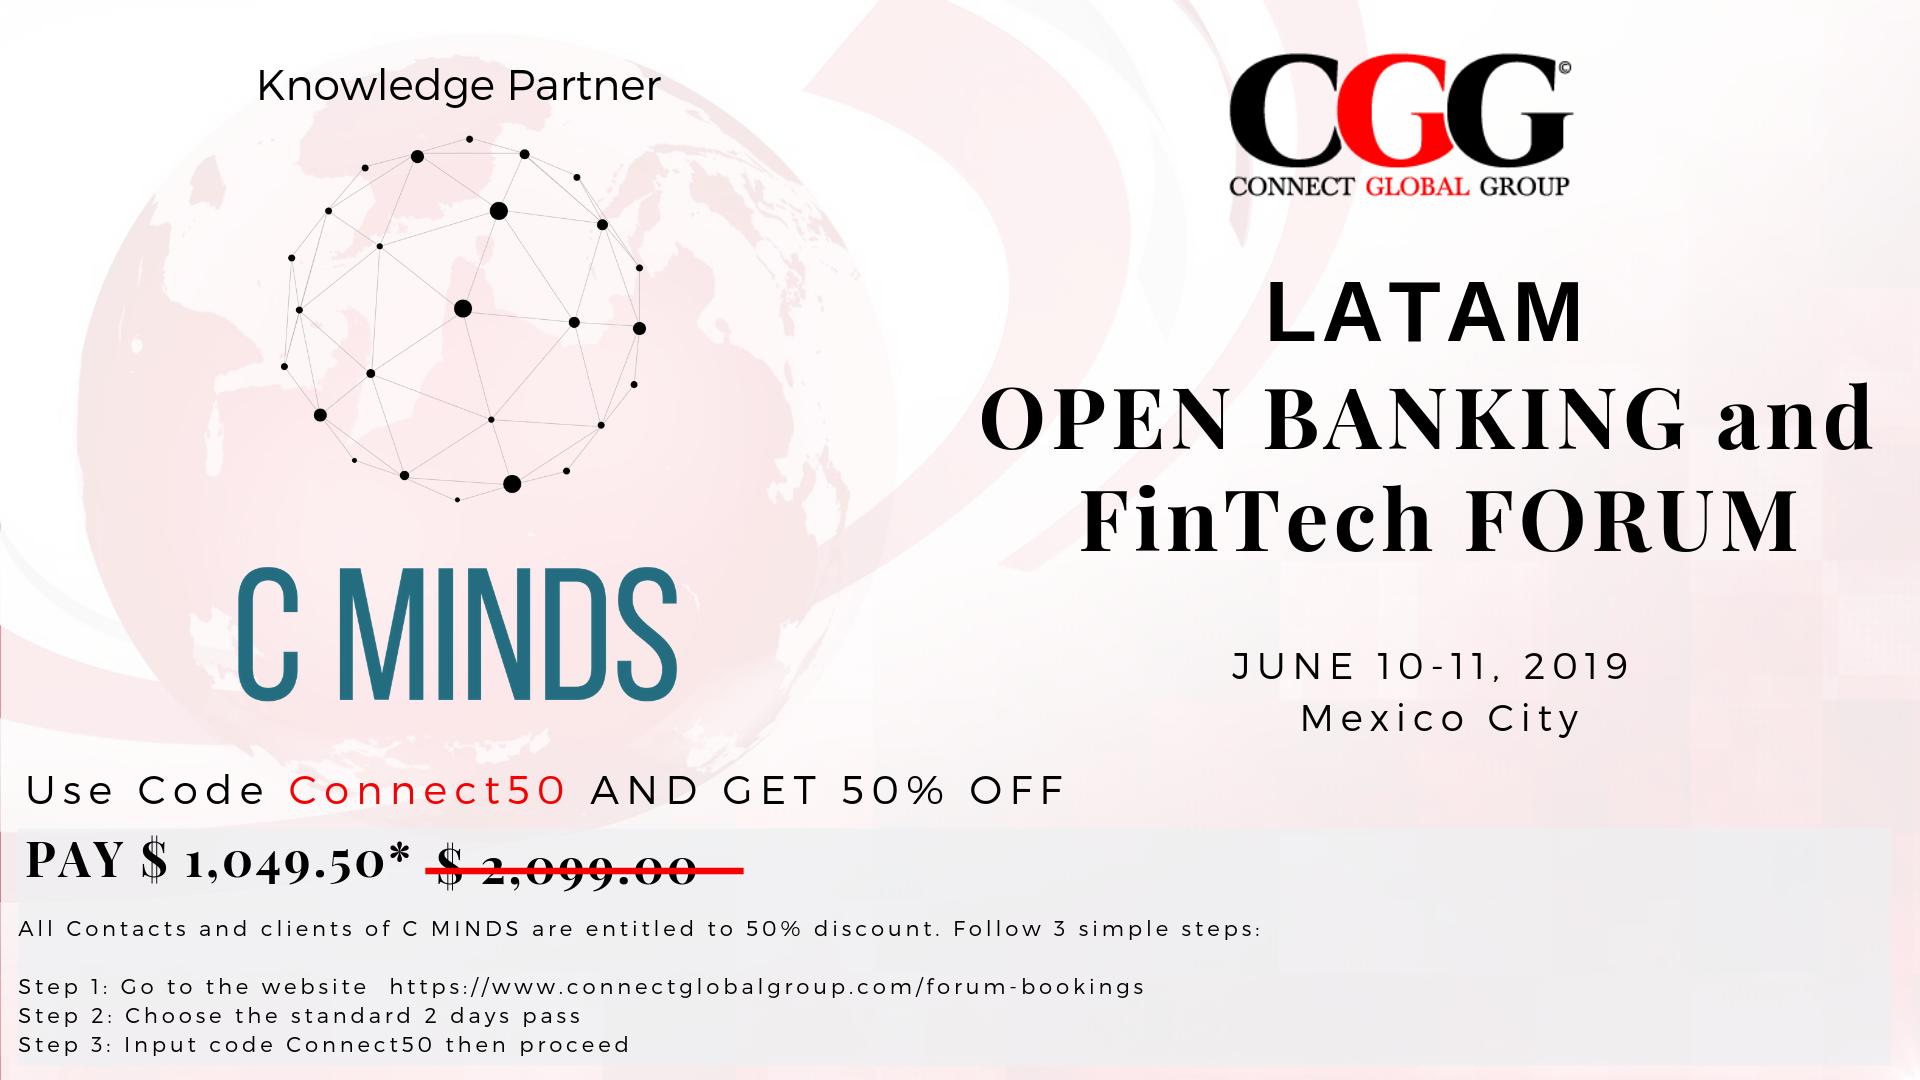 LATAM Open Banking and FinTech Forum